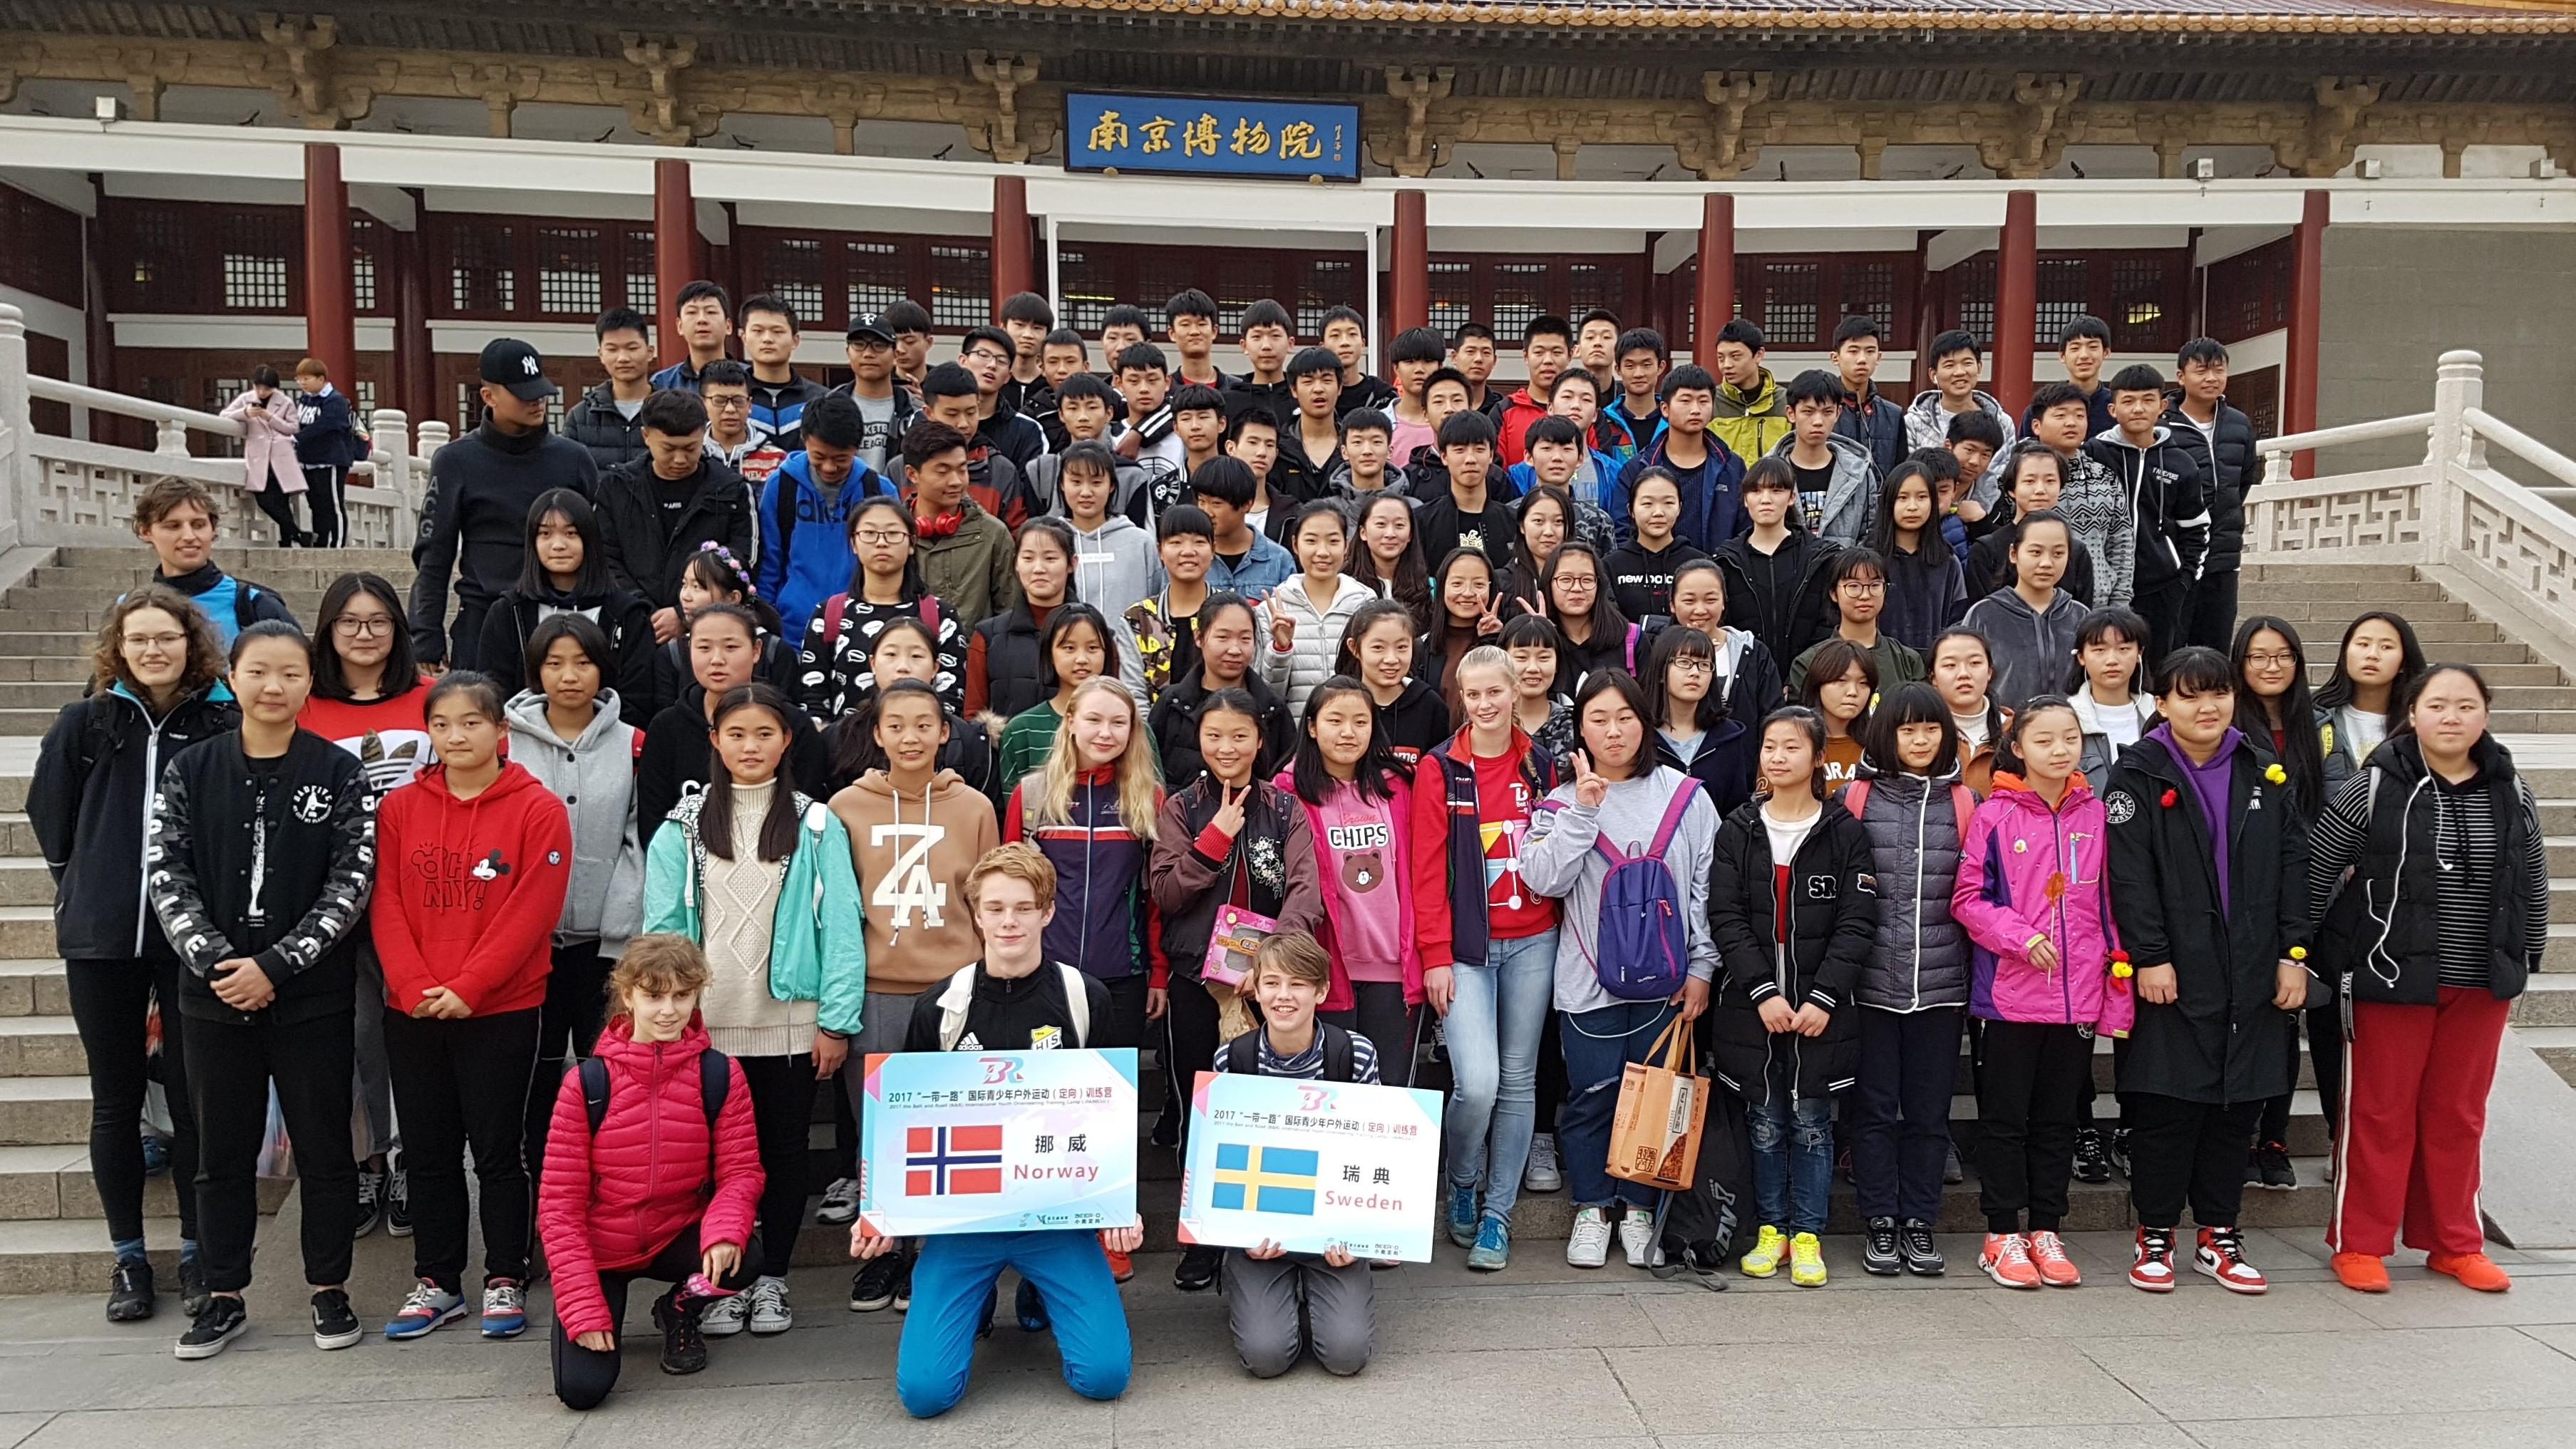 Østmarka orienteringsklubb på tur til Kina (2017)